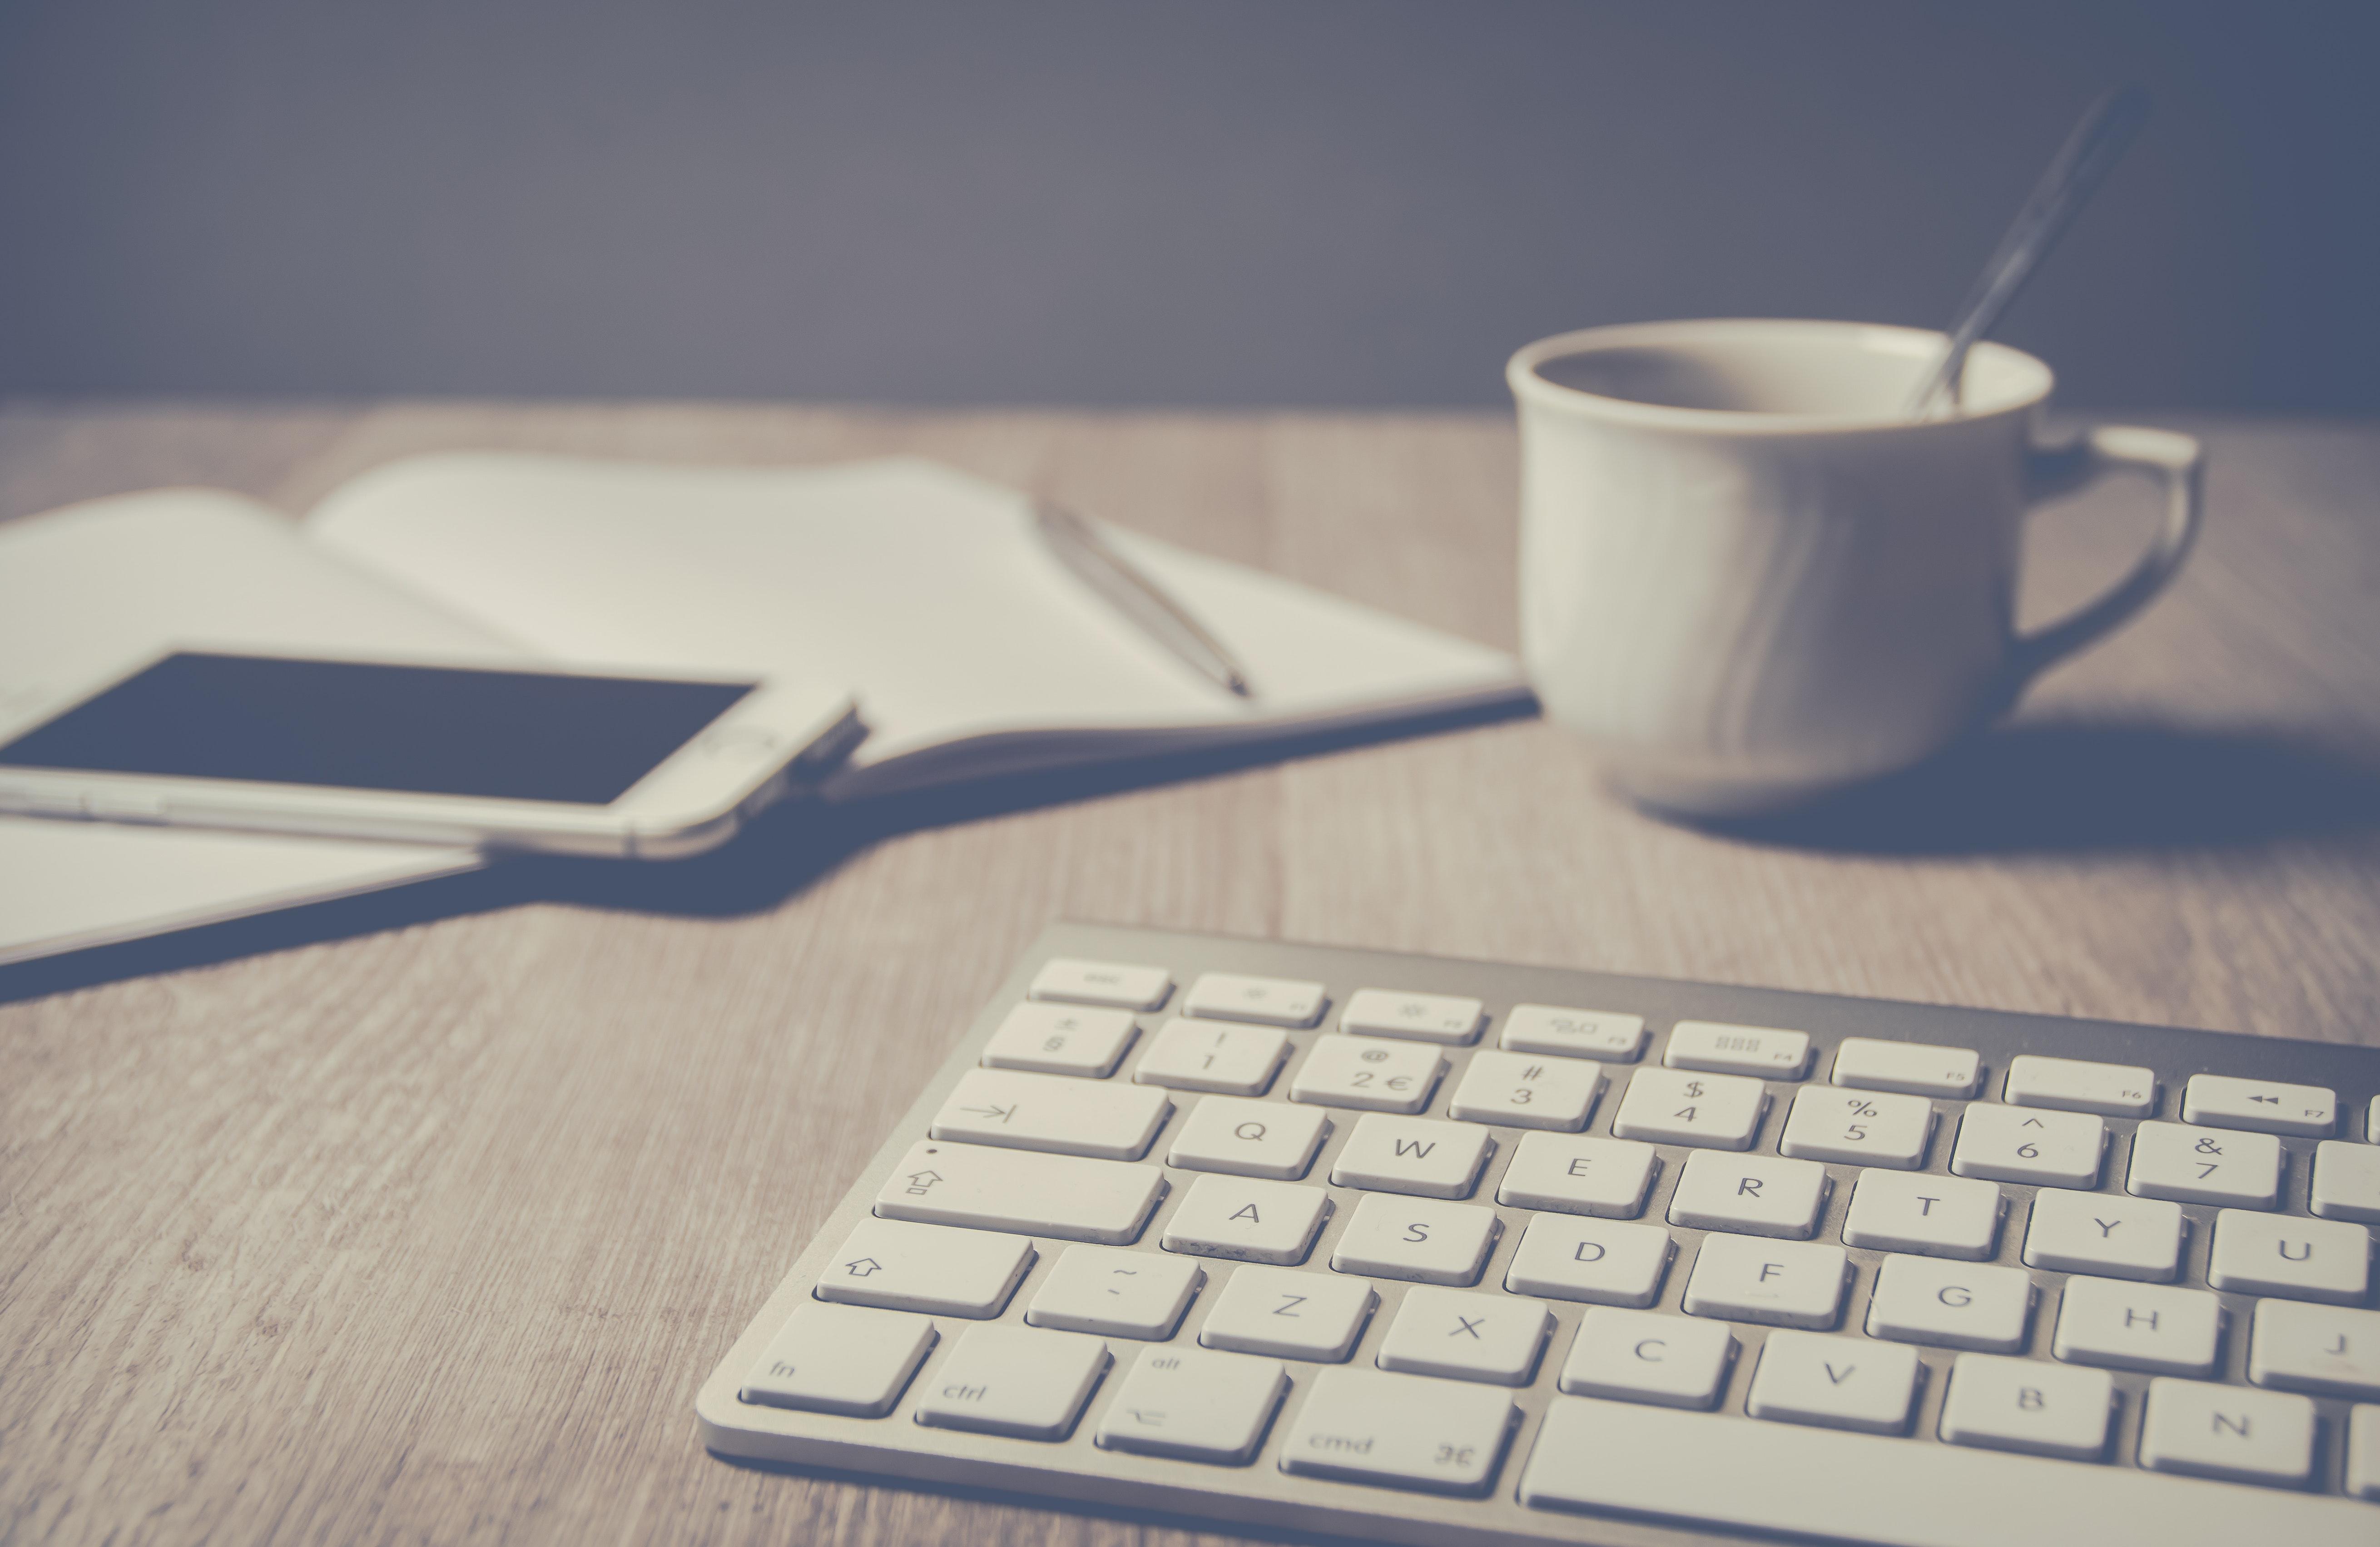 Magic keyboard beside coffee mug on desk photo